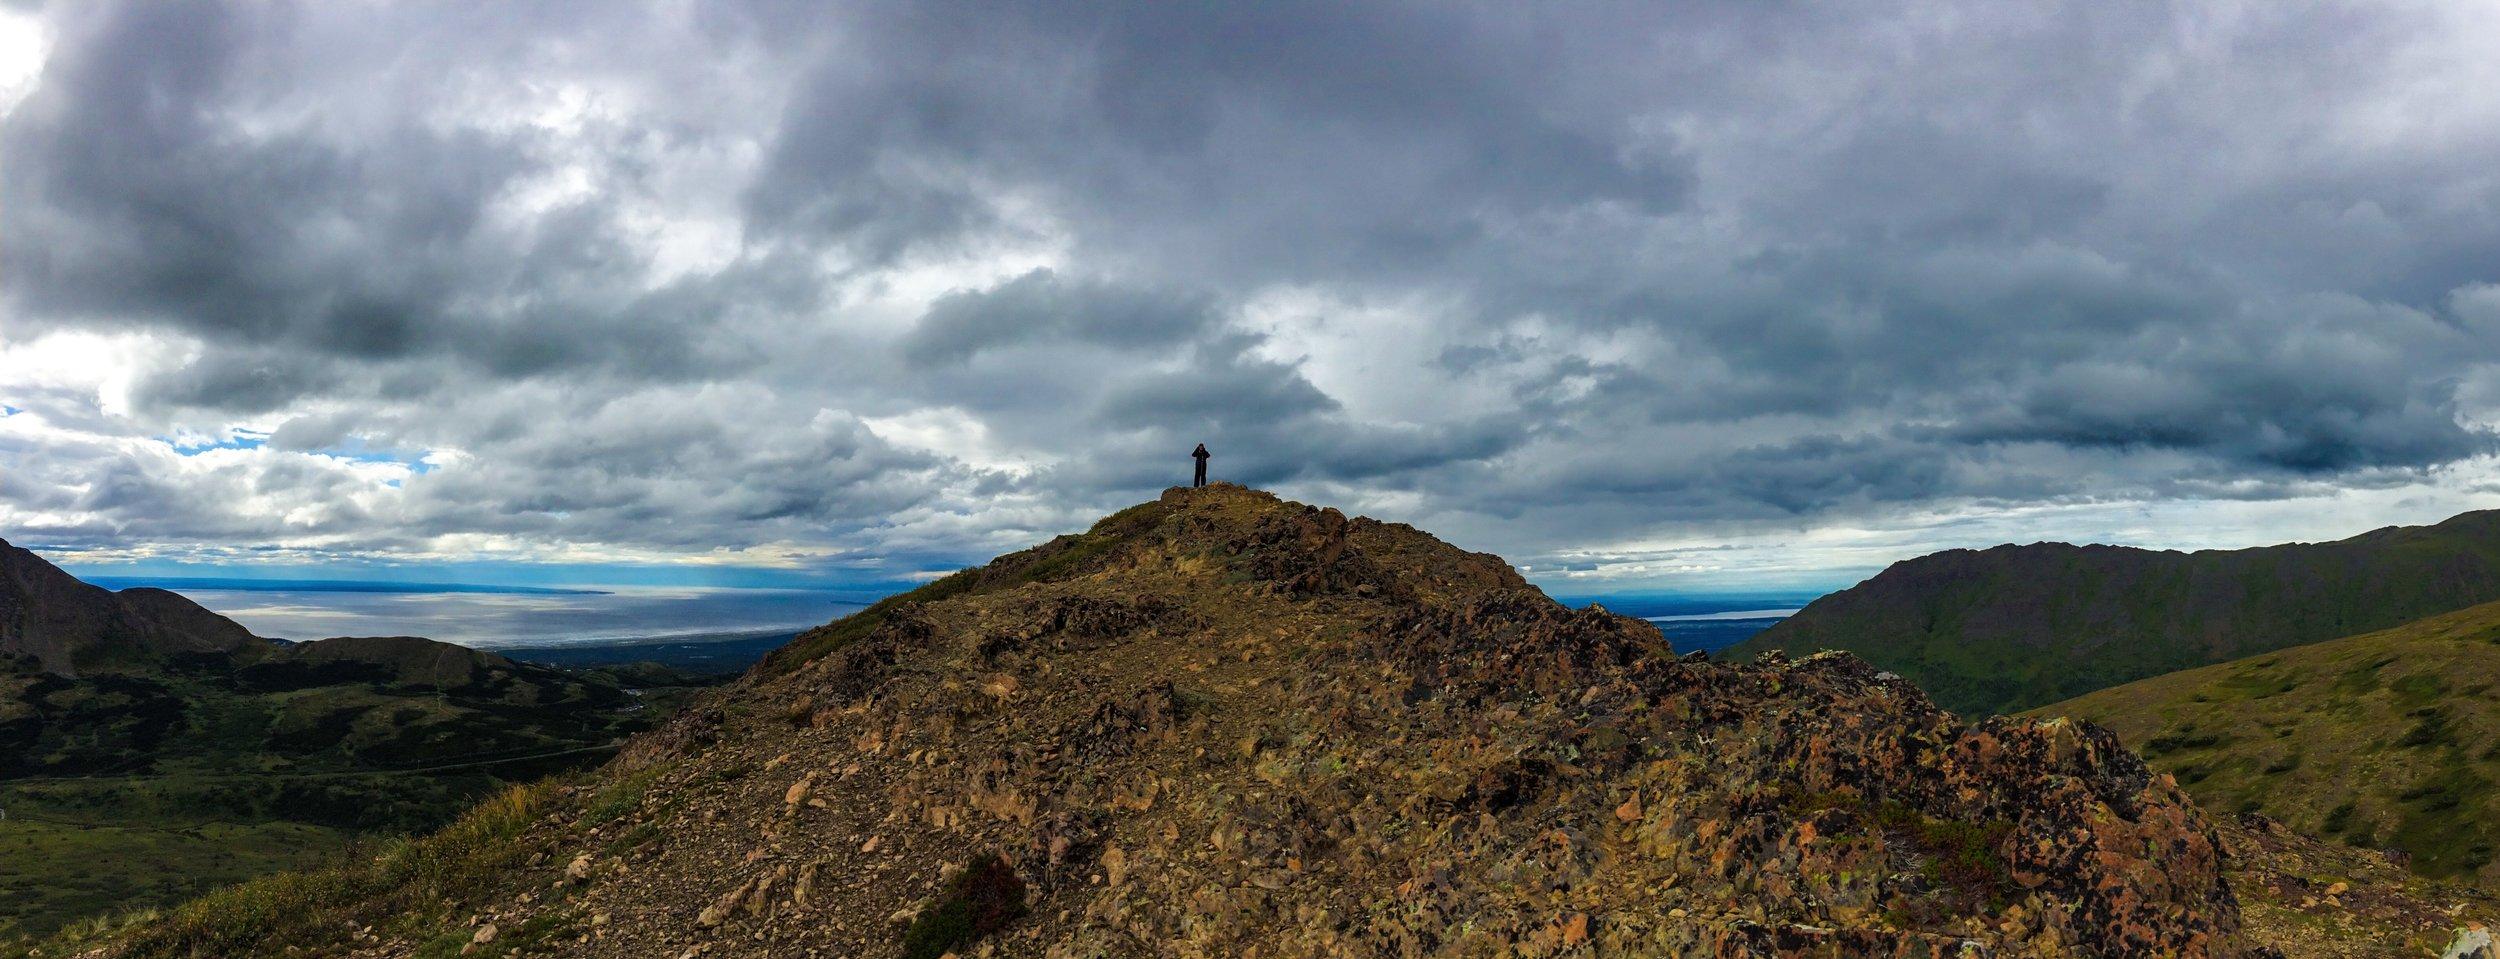 Me on the smaller peak